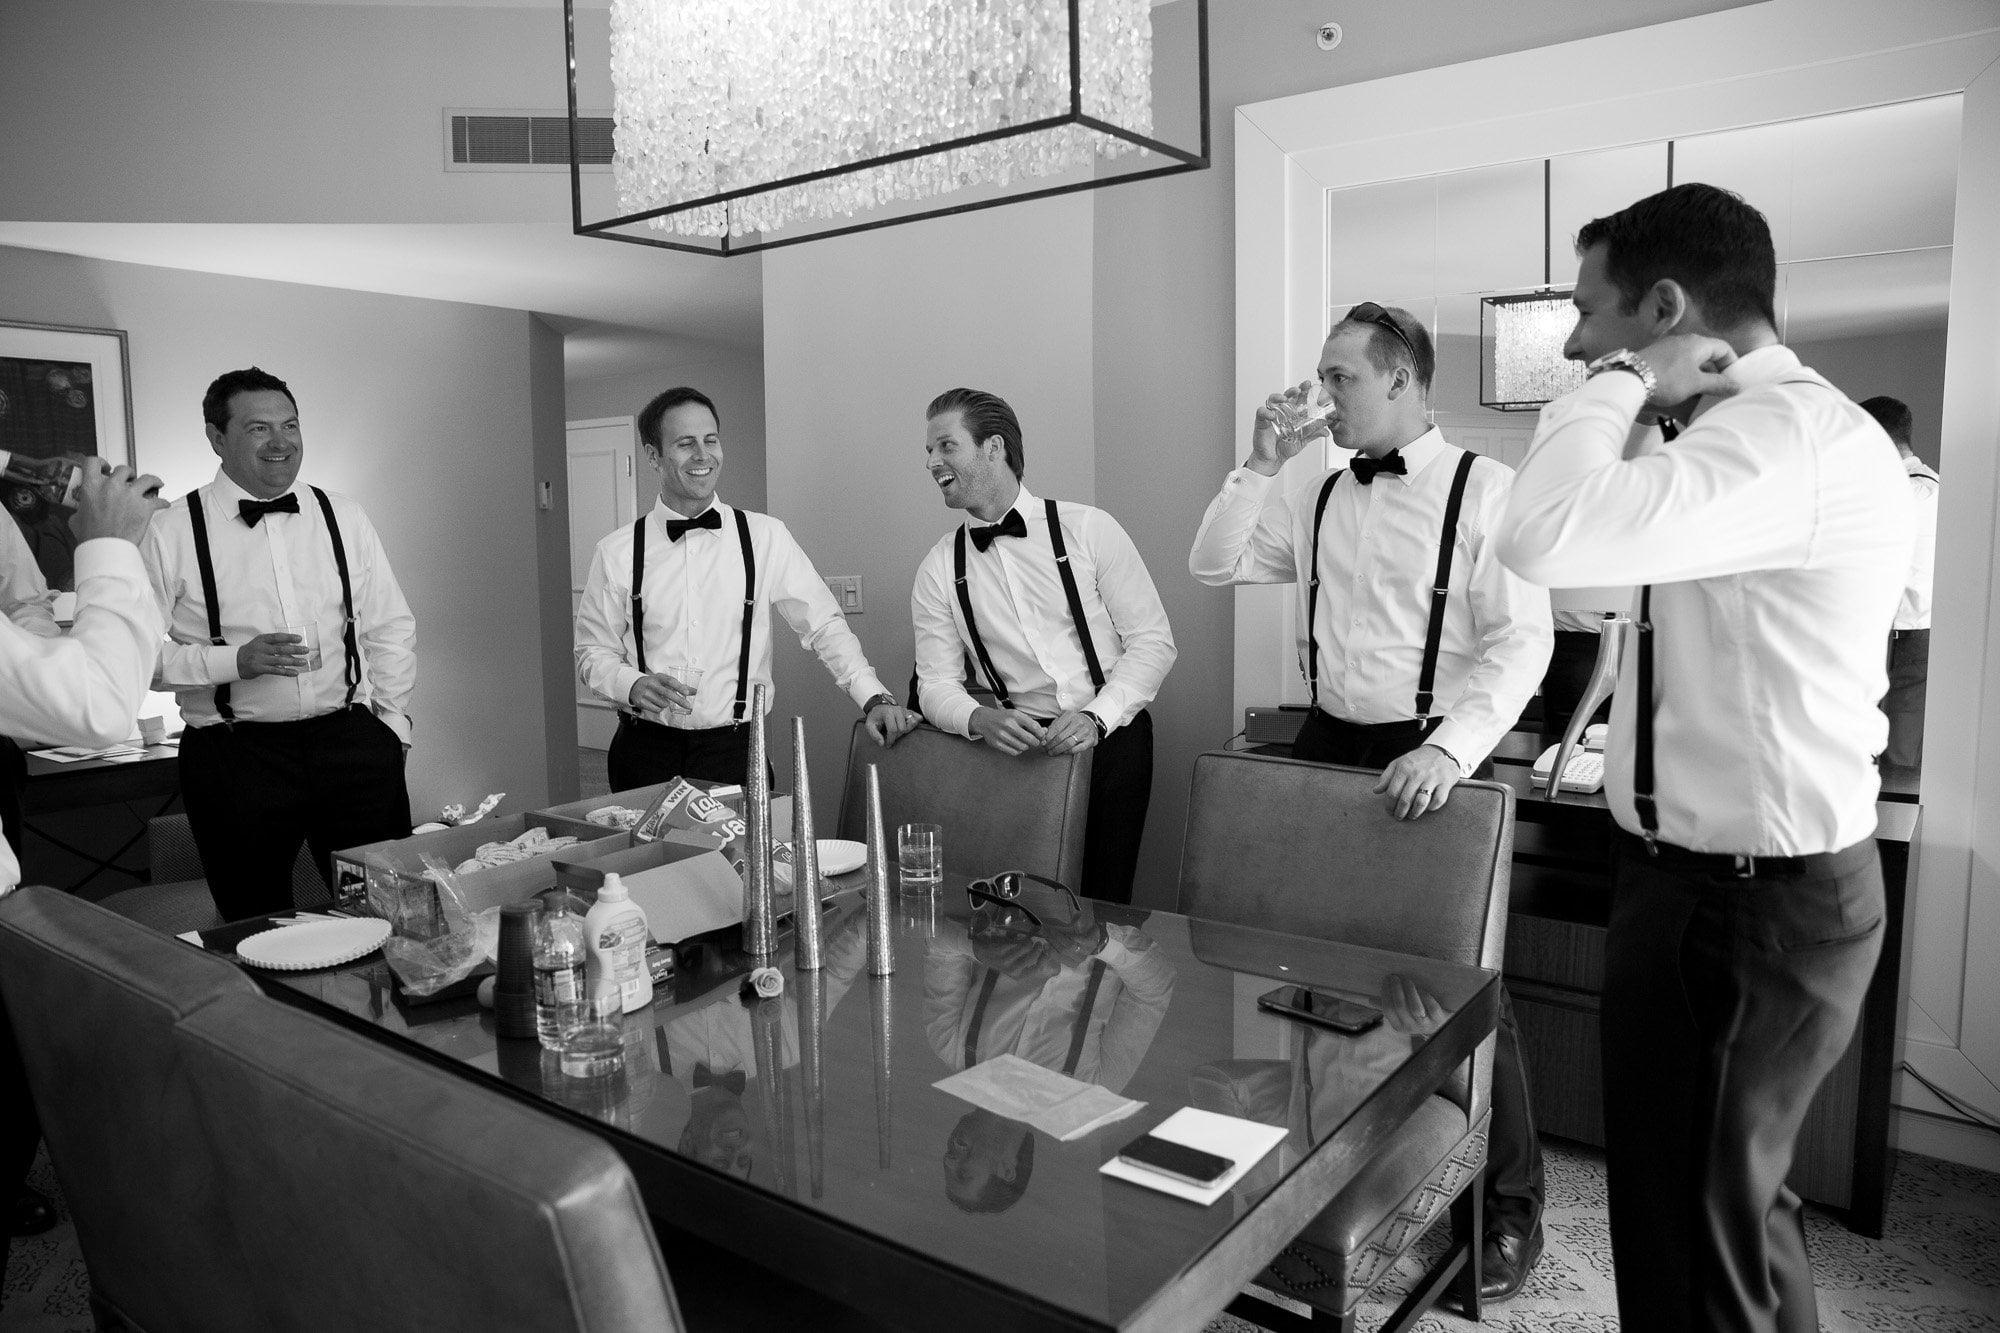 Wedding Example Gallery-Getting Ready-0008.jpg